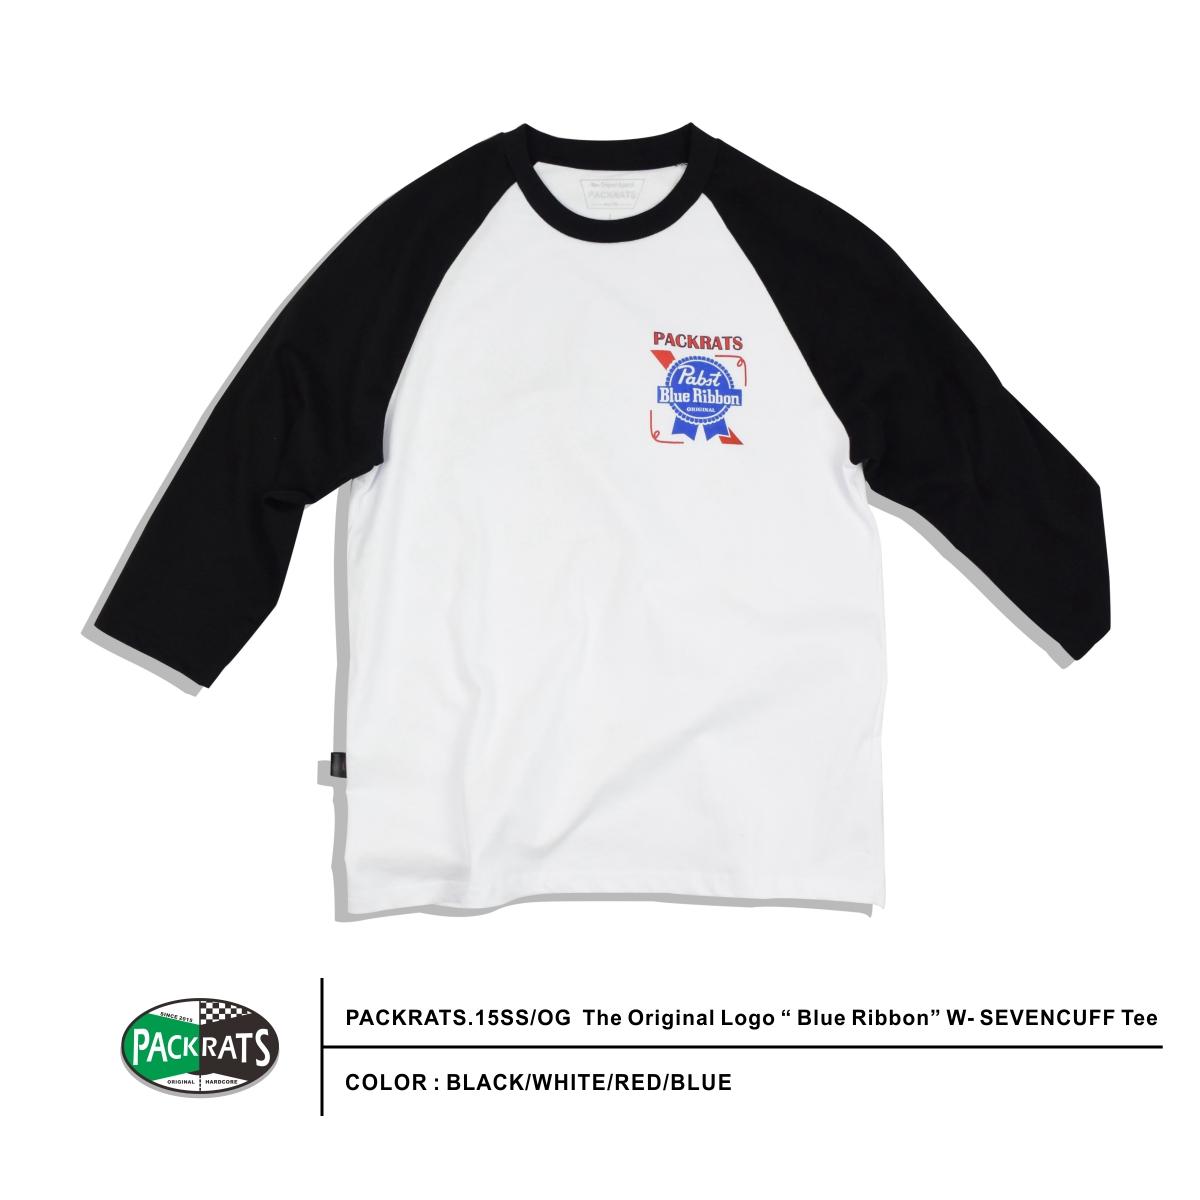 Футболка мужская Packrats Packrats 2015ss/og t4 .15SS/OG The Original Logo Blue Ribbon W- SEVEN cheap original evolis r2012 blue monochrome ribbon